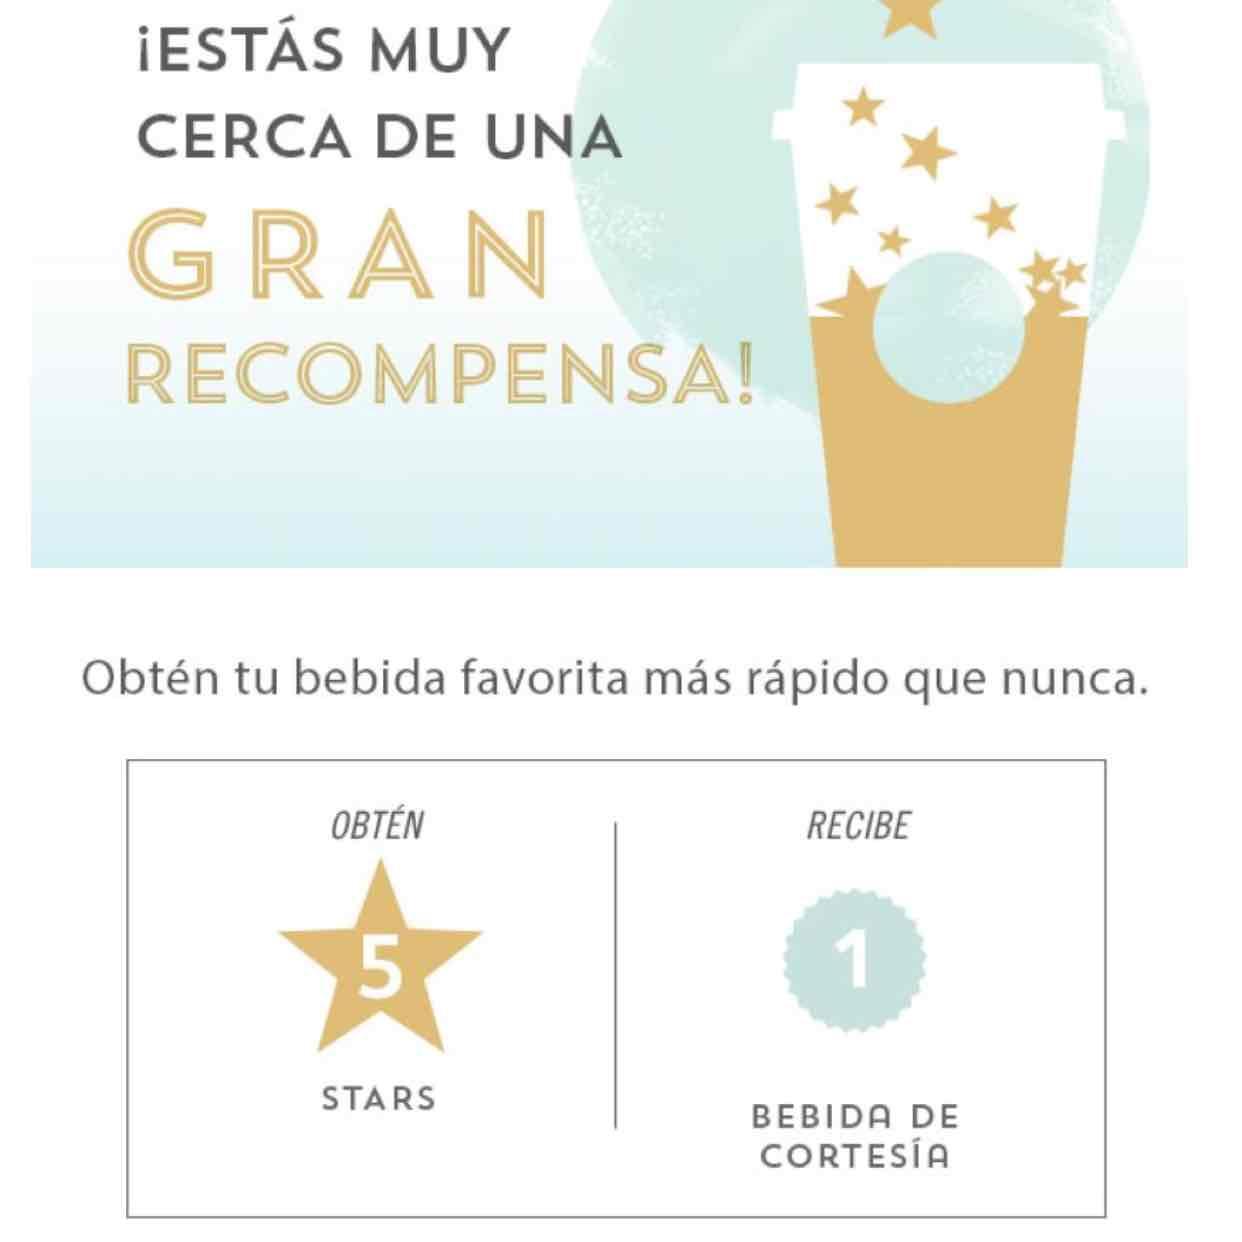 Starbucks: bebida gratis cada 5 stars